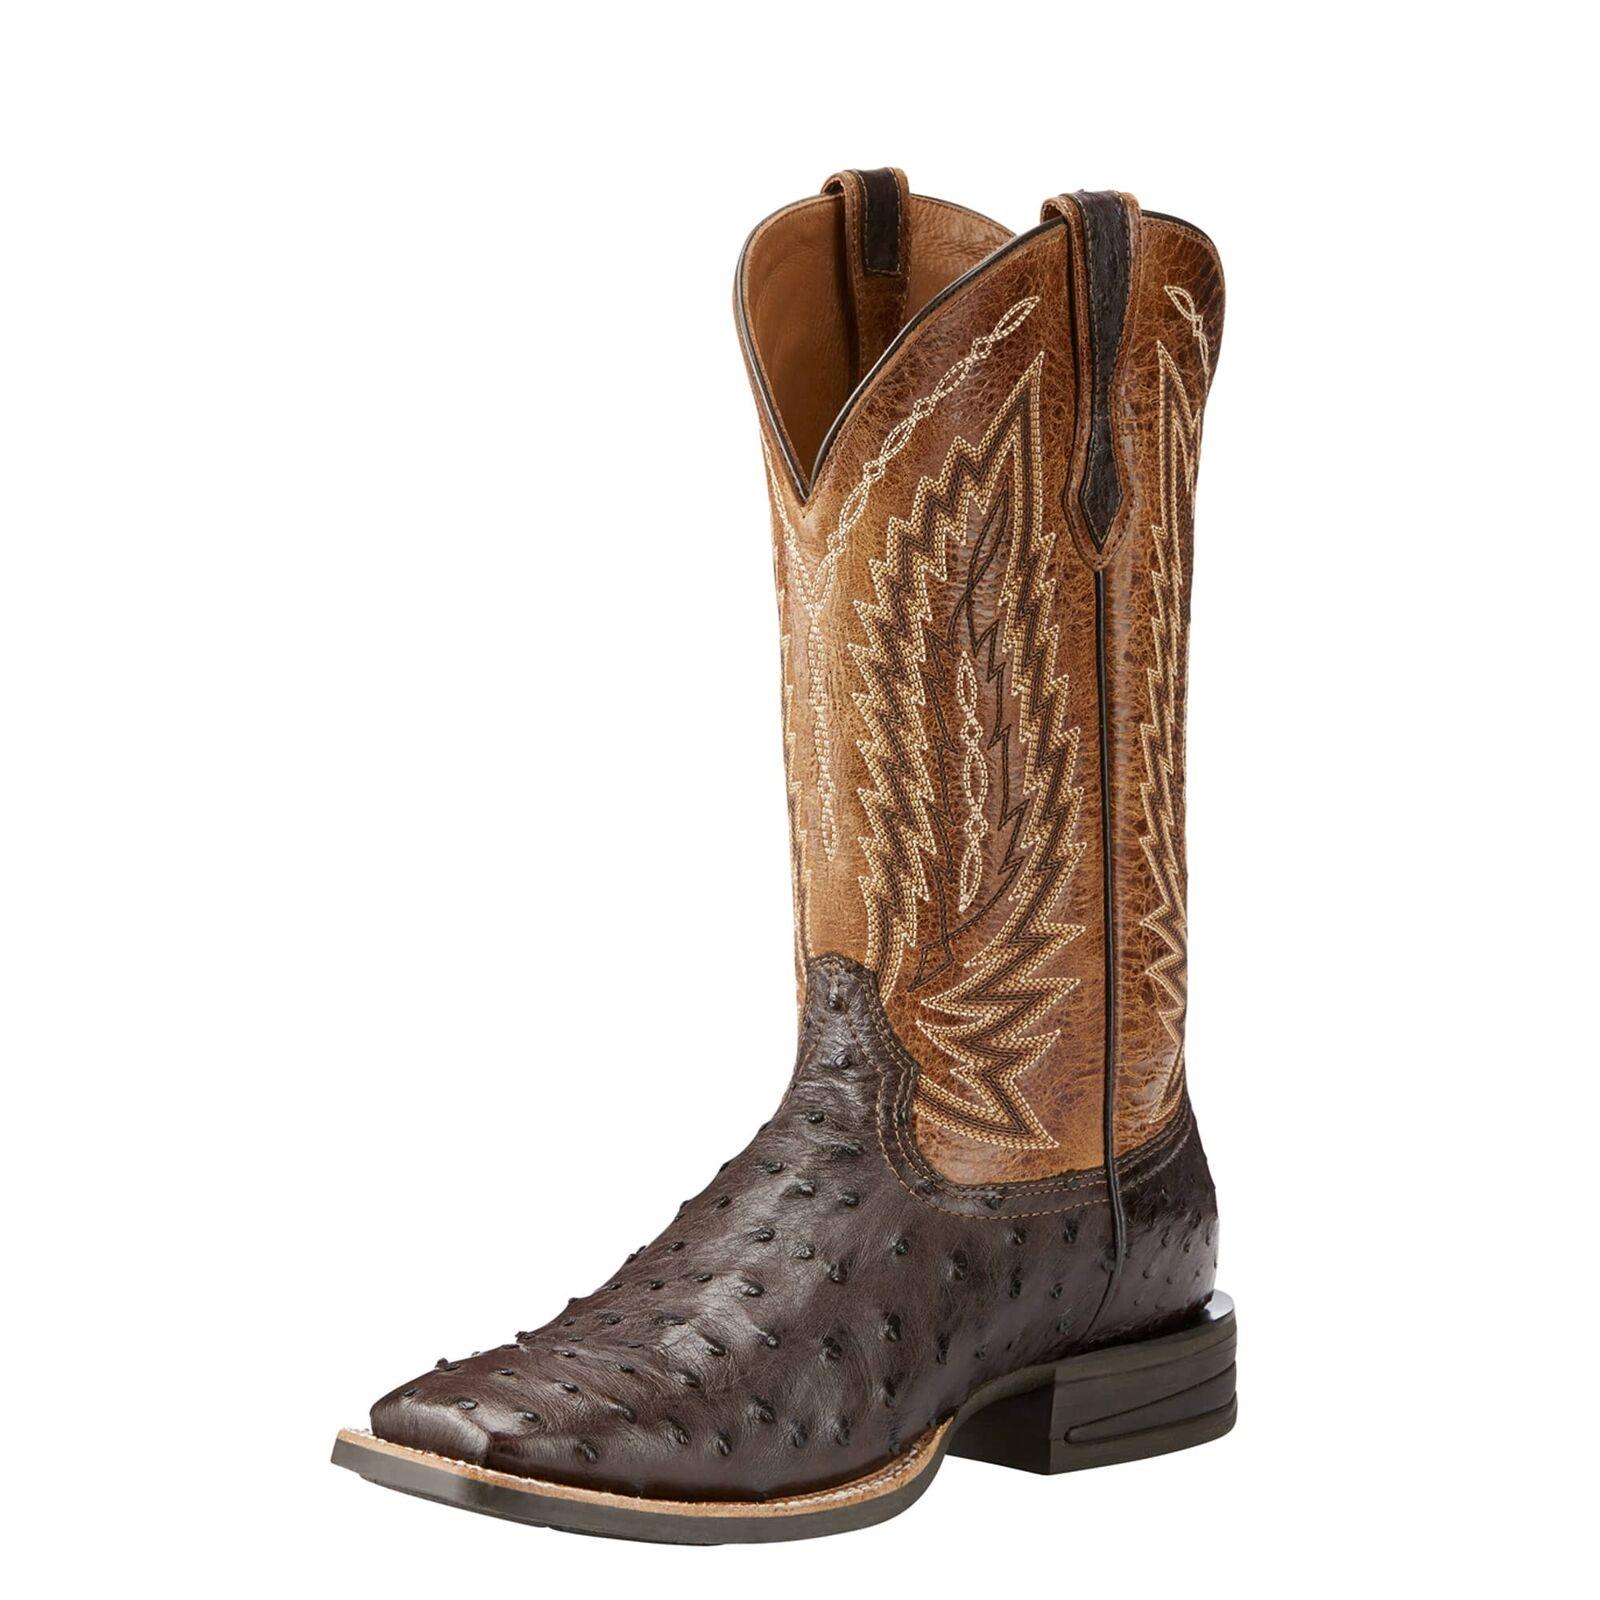 Ariat 10025180 Men Relentless Platinum Tabacco Full Quill Ostrich Western stivali